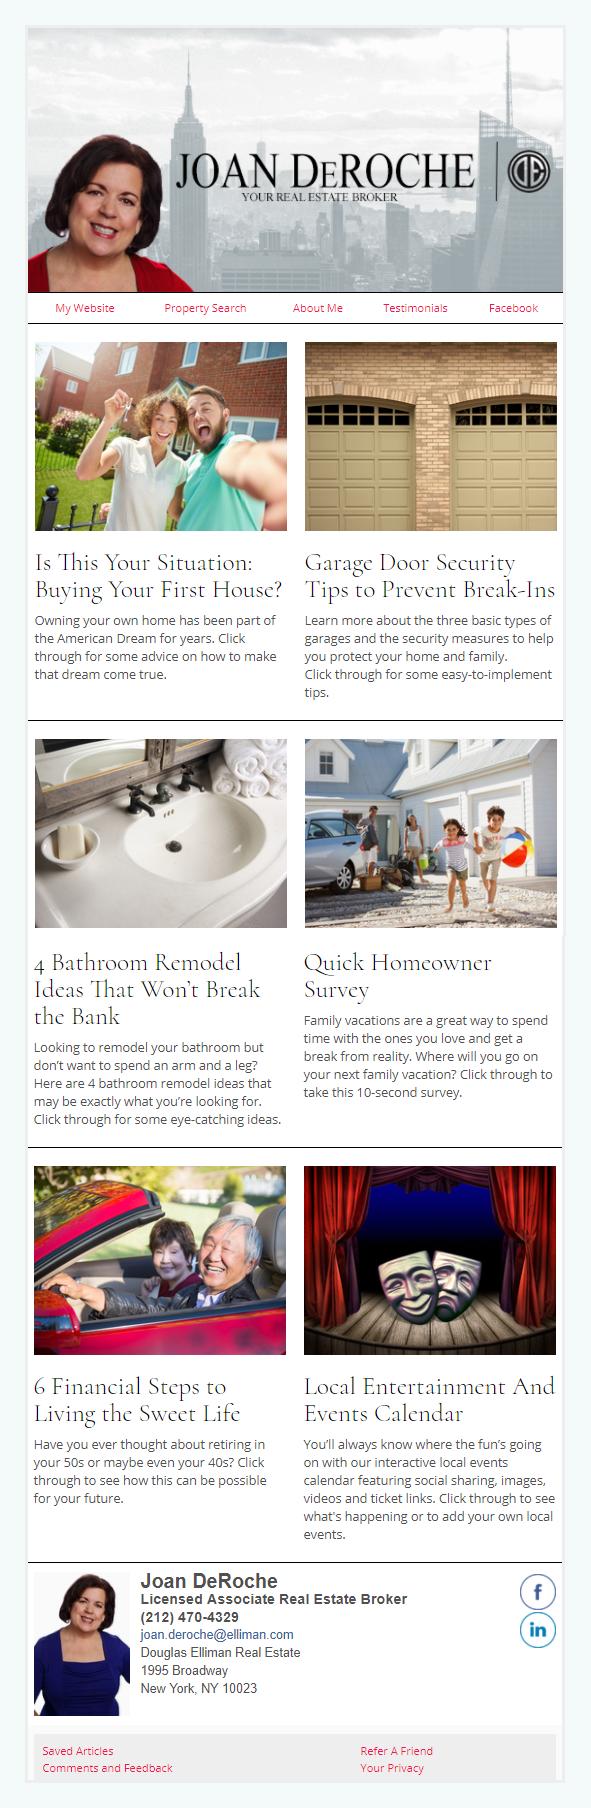 Joan DeRoache With Douglas Elliman Real Estate - HomeActions Sample Email Newsletter